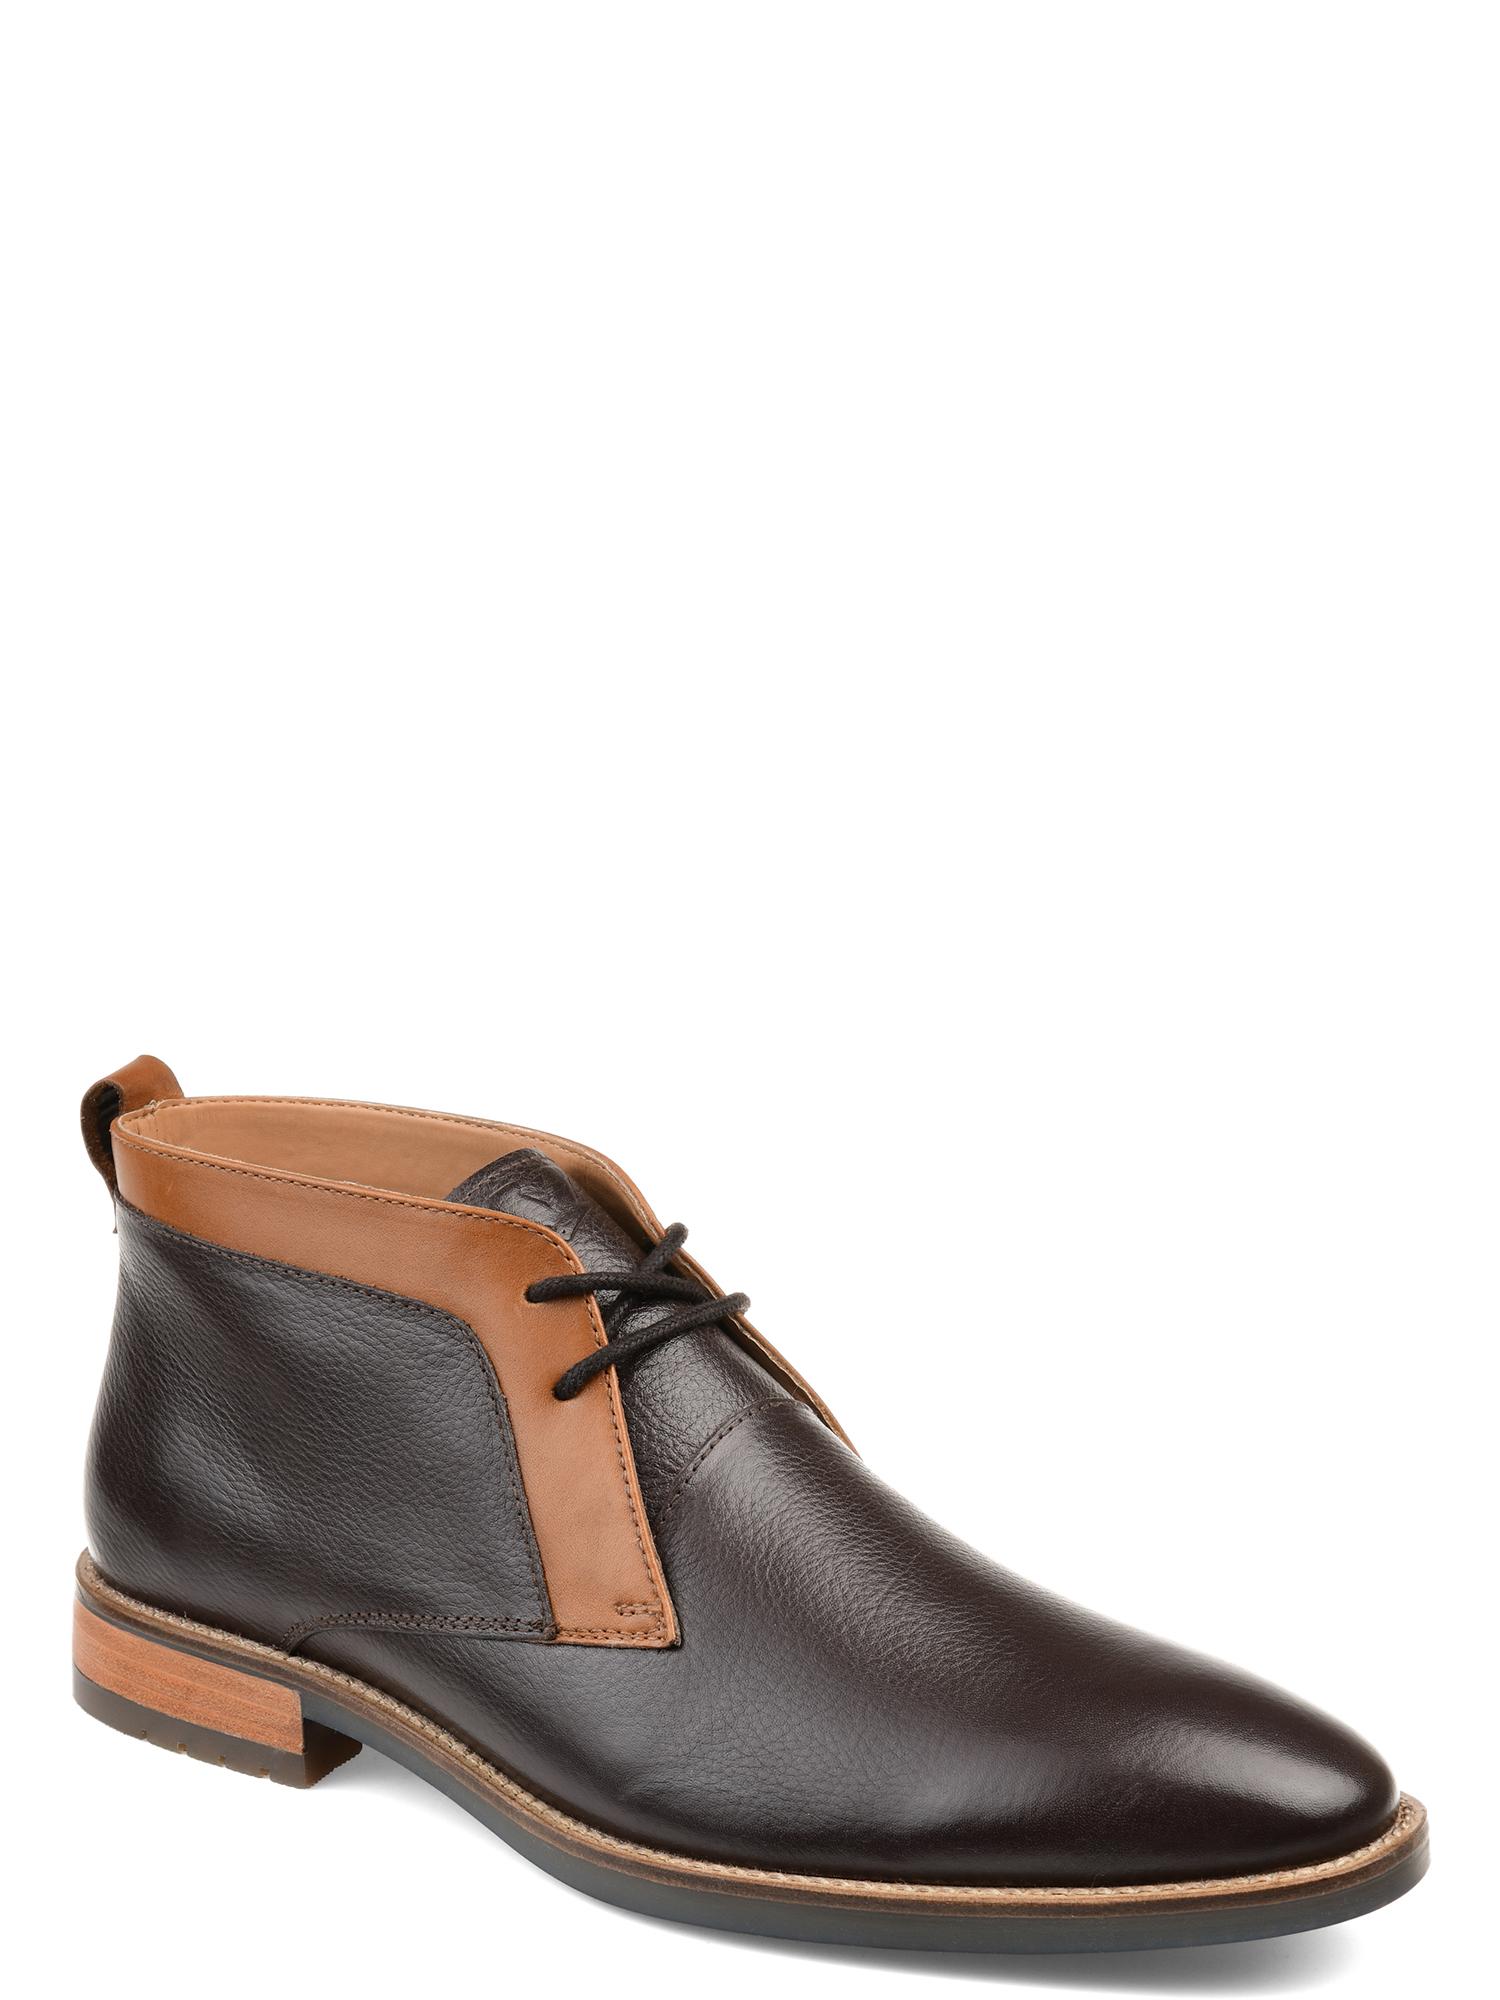 Daxx Men's Seth Leather Chukka Boot